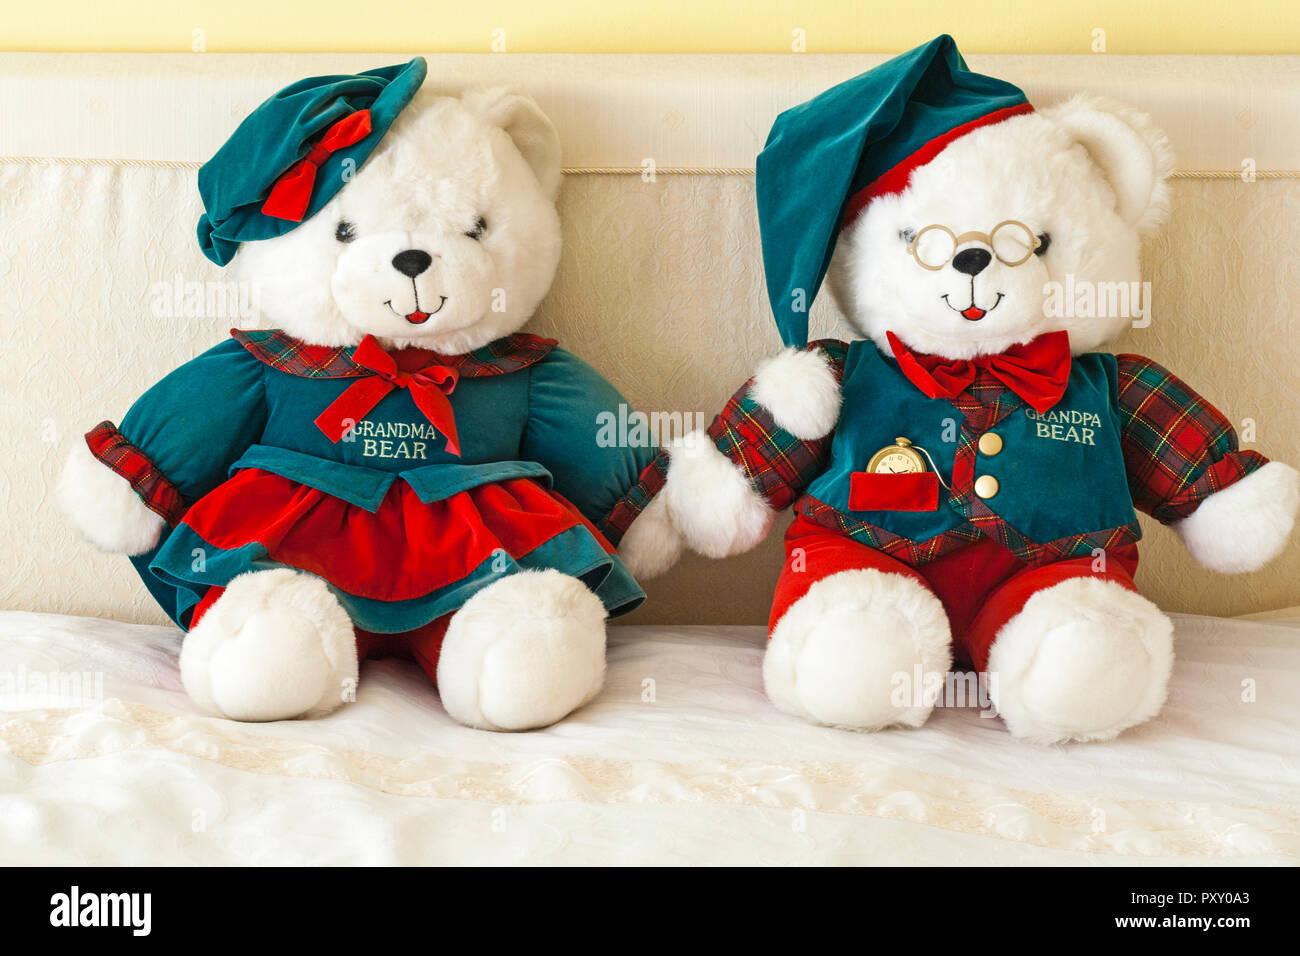 Teddy Bears - Grandparents Limited Edition by DanDee - Grandma Bear and Grandpa Bear teddy bears teddies soft cuddly toys Stock Photo